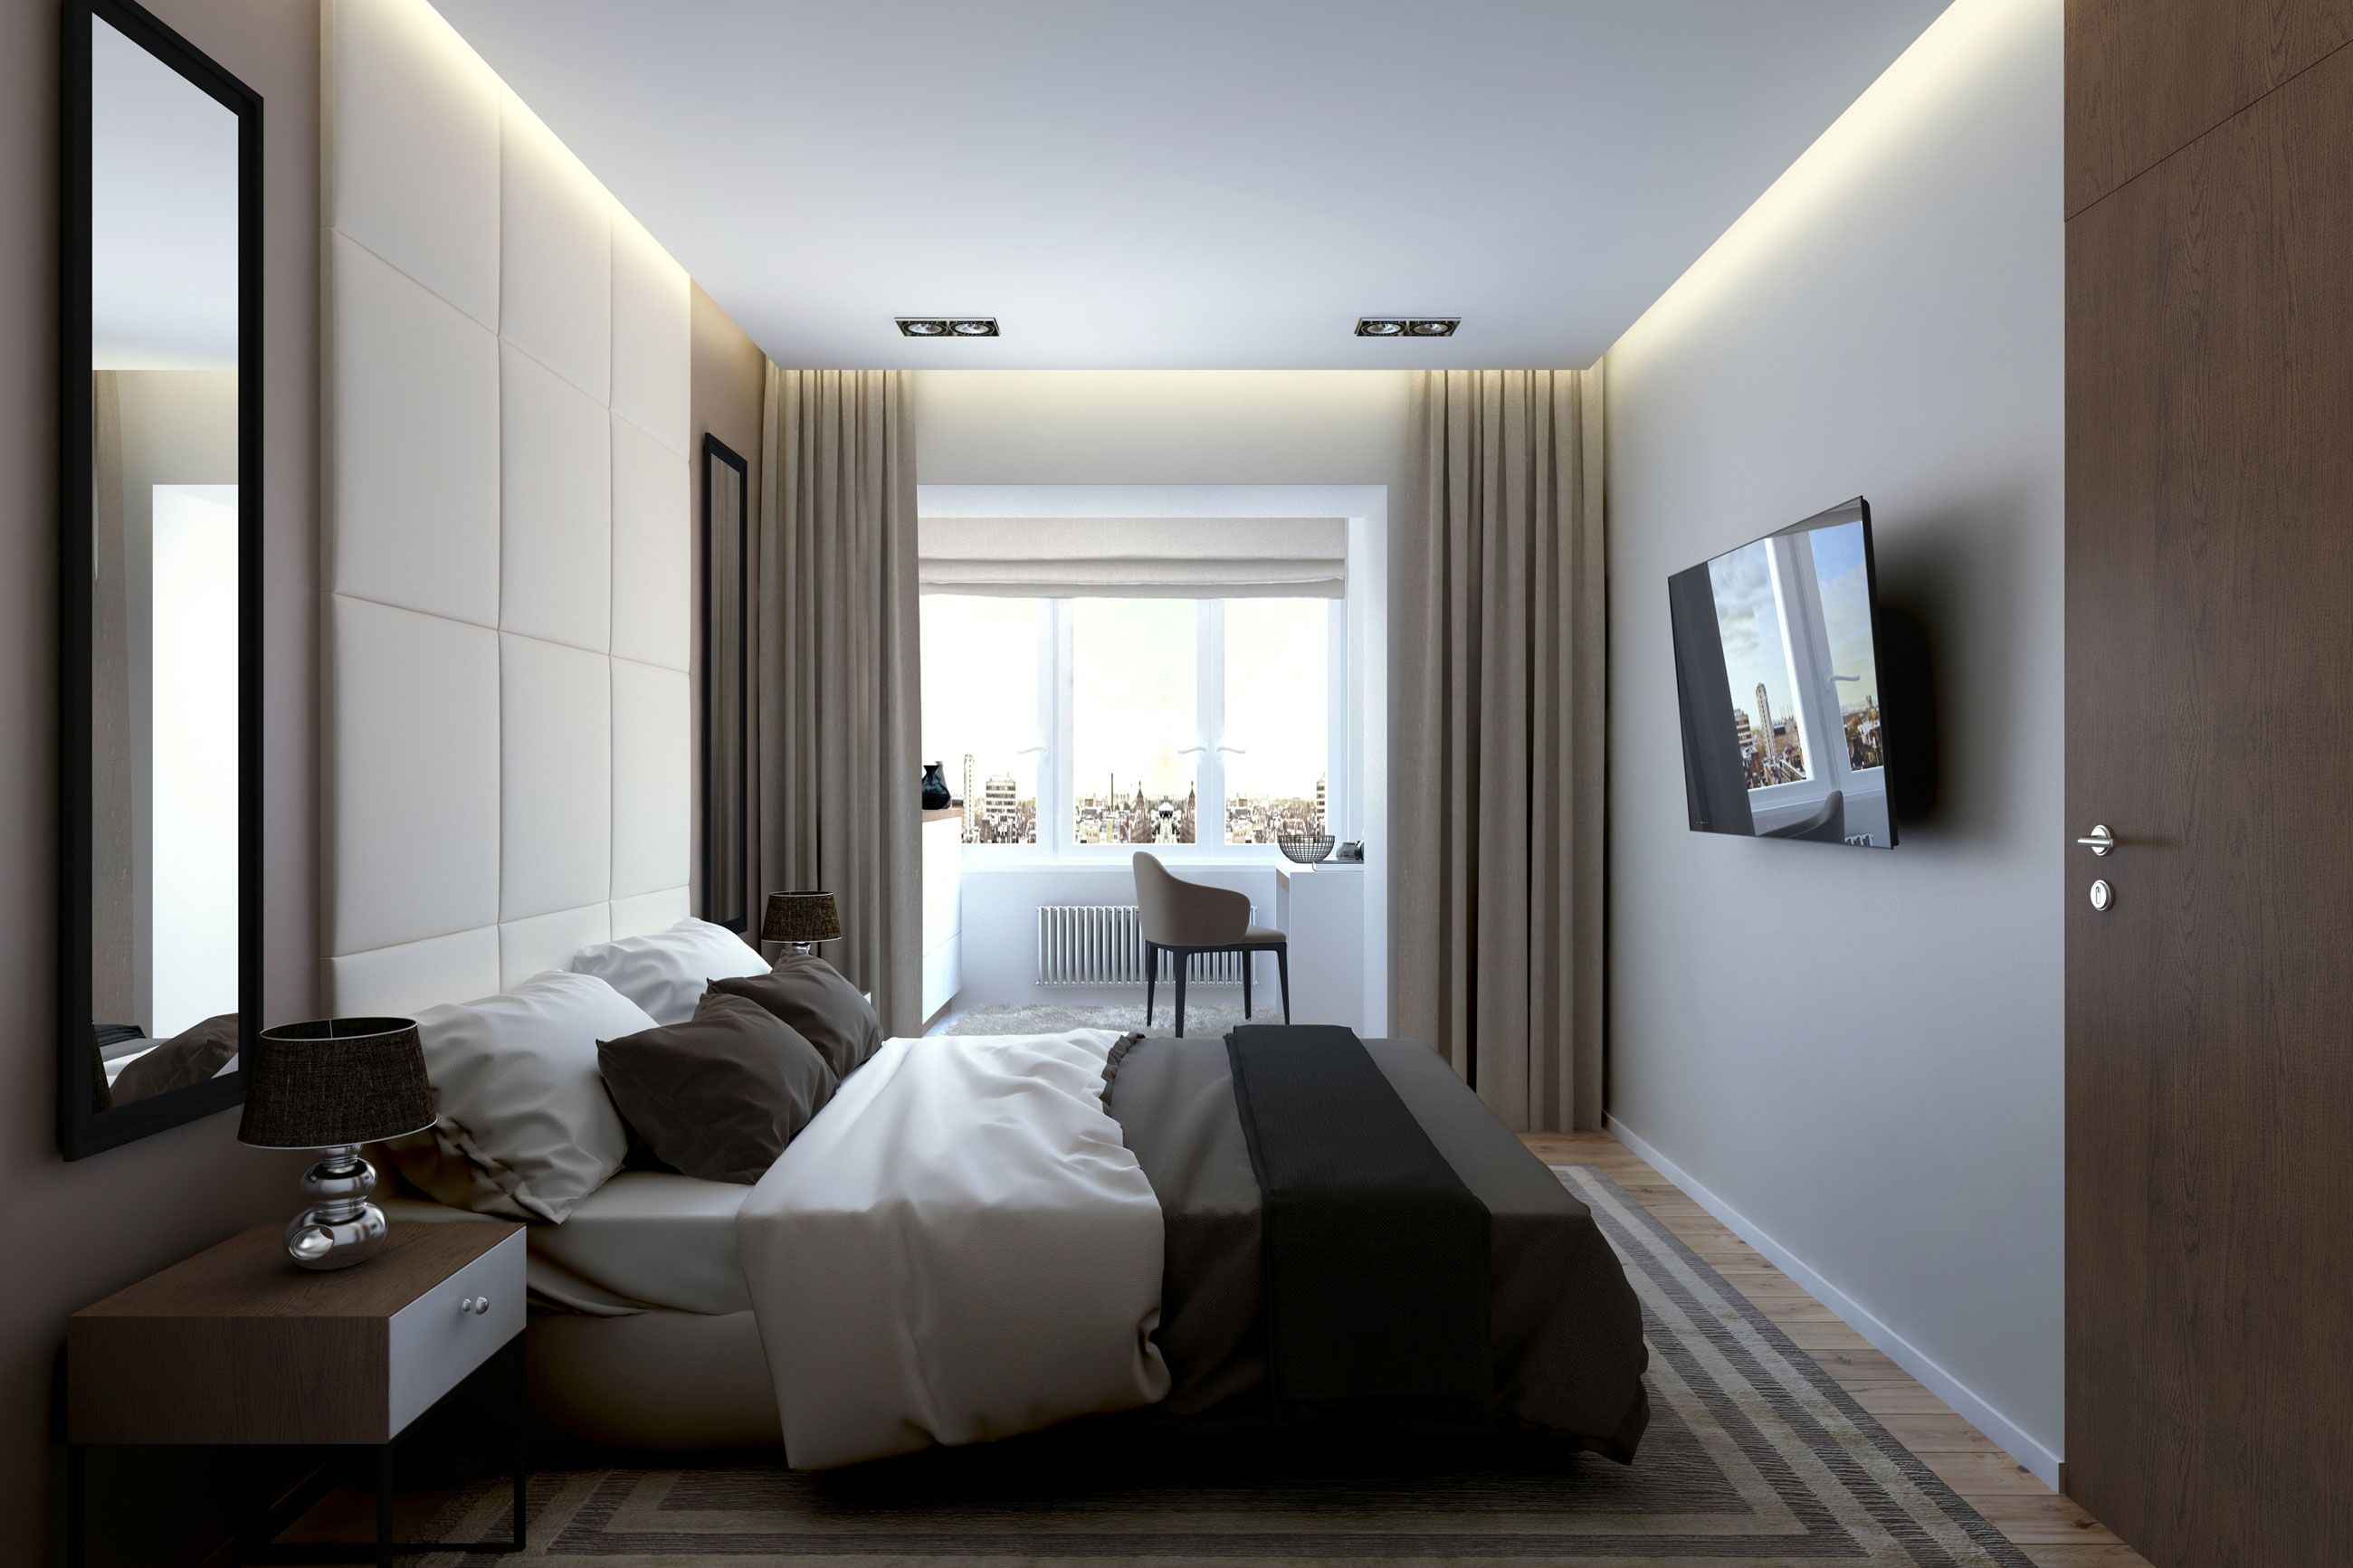 bogatyrskiy modern apartmentgeometrium - caandesign